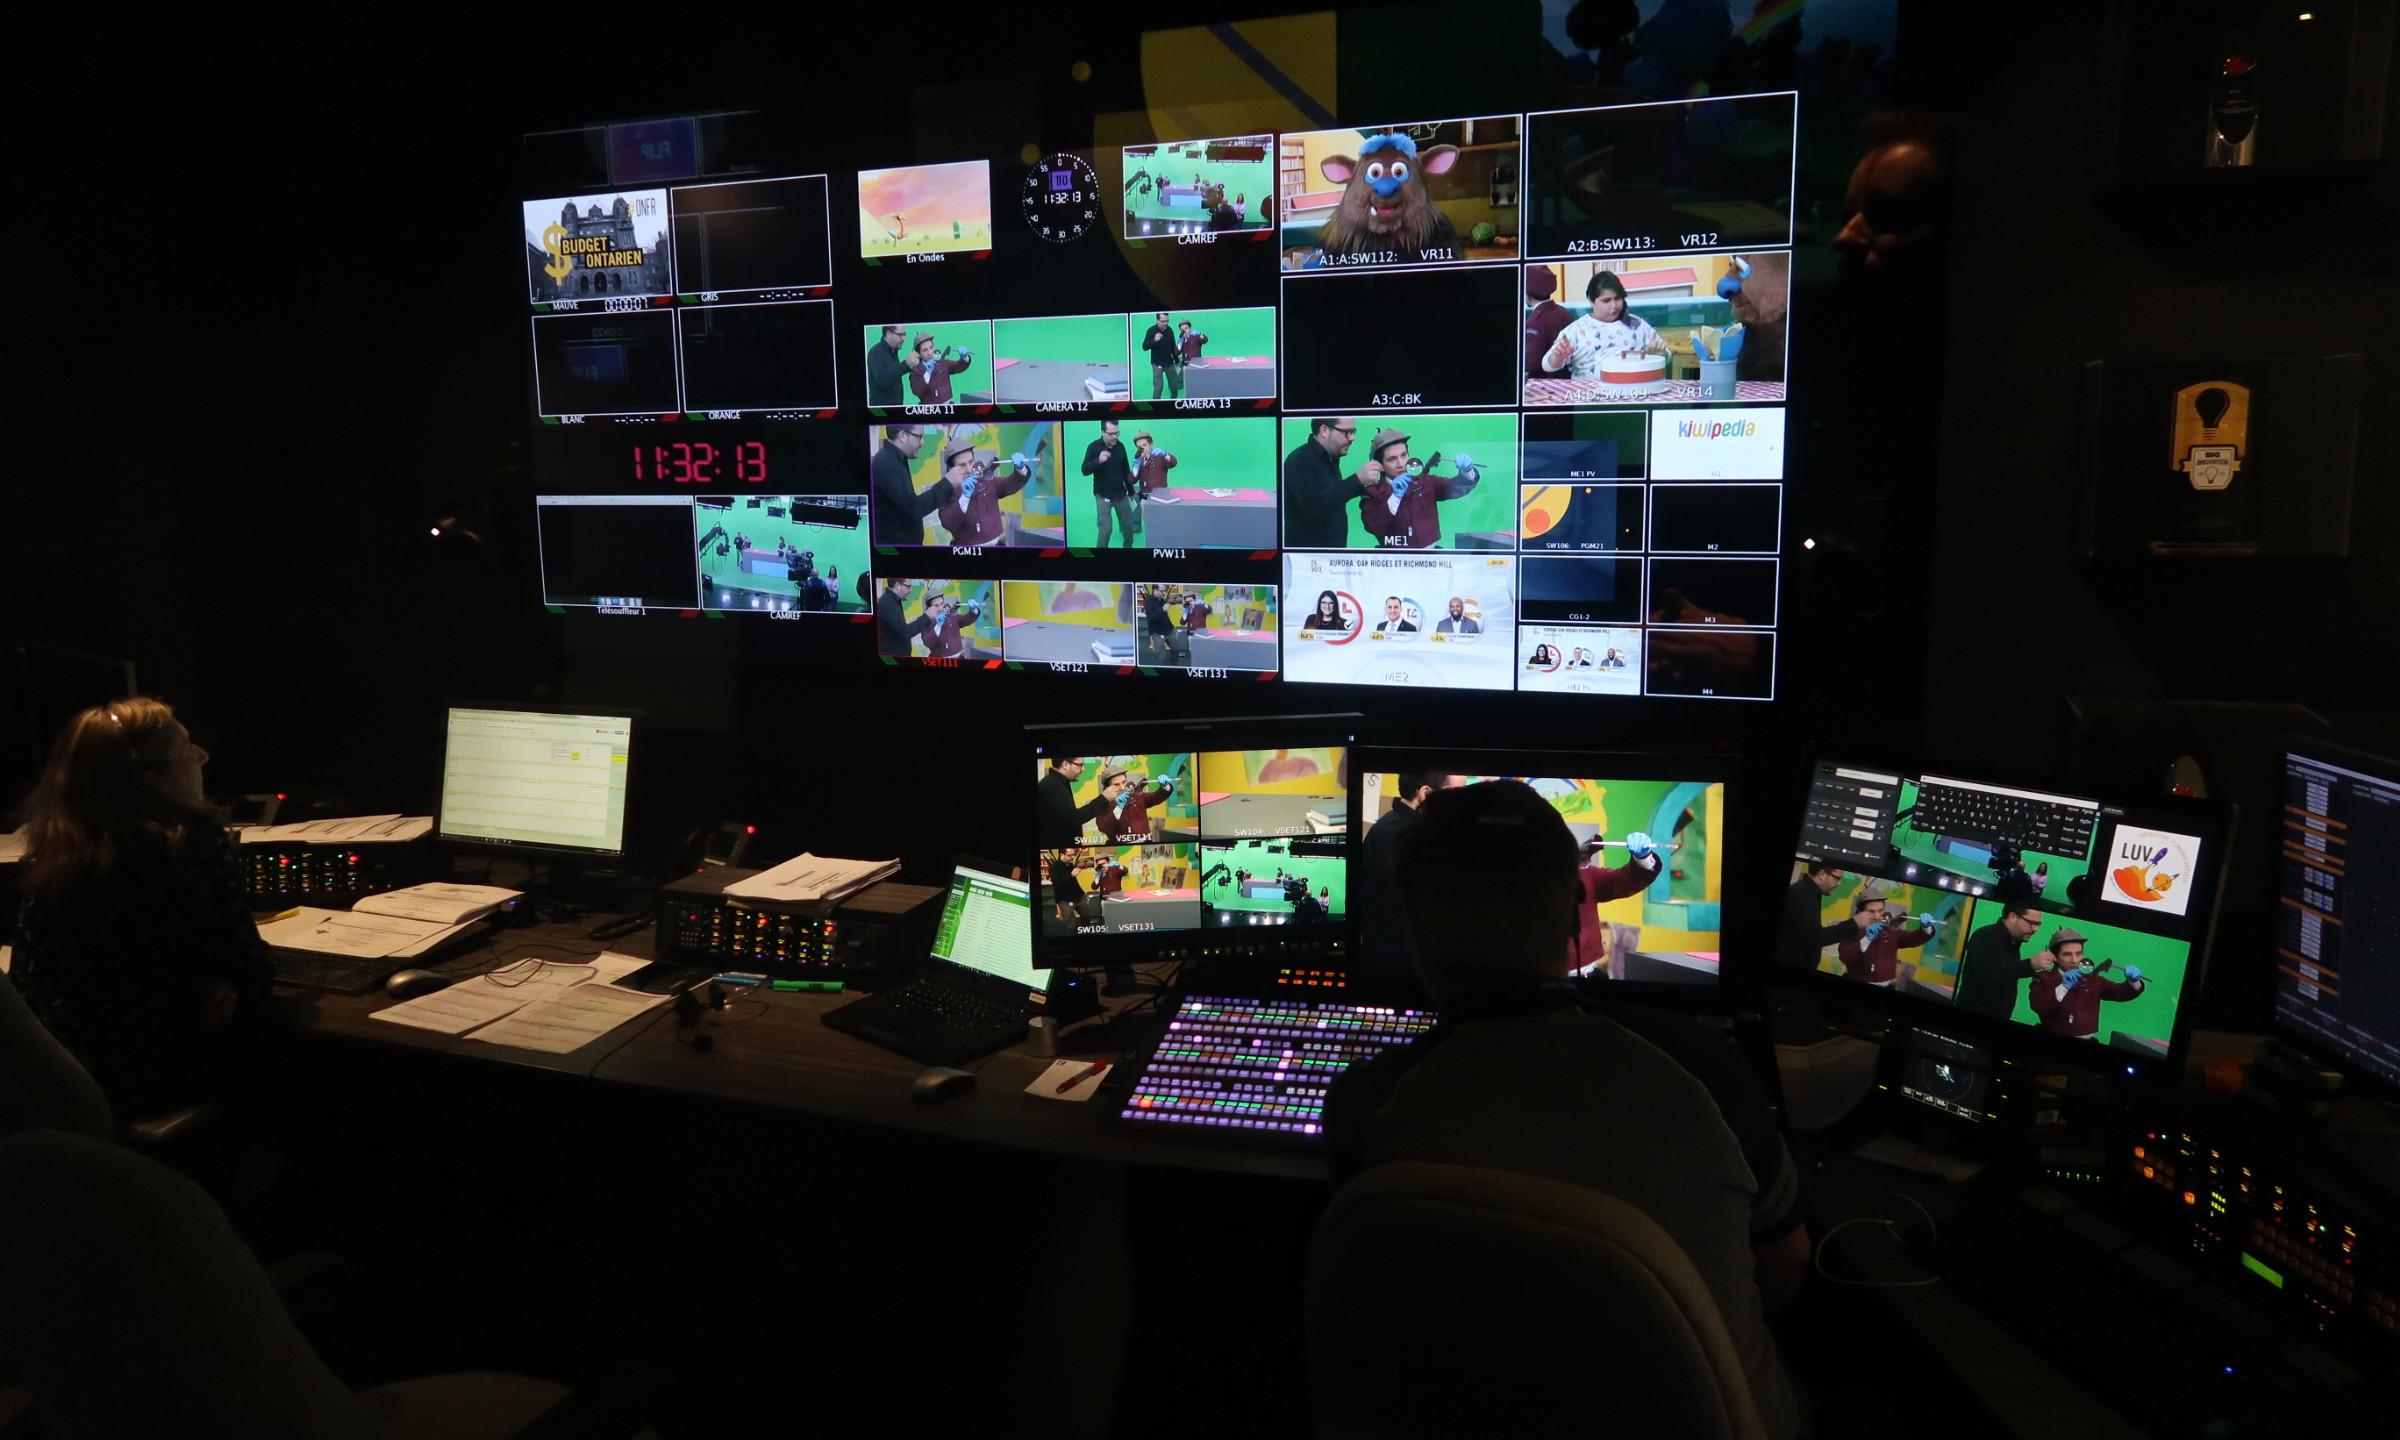 Day 2: Green Screen Studio